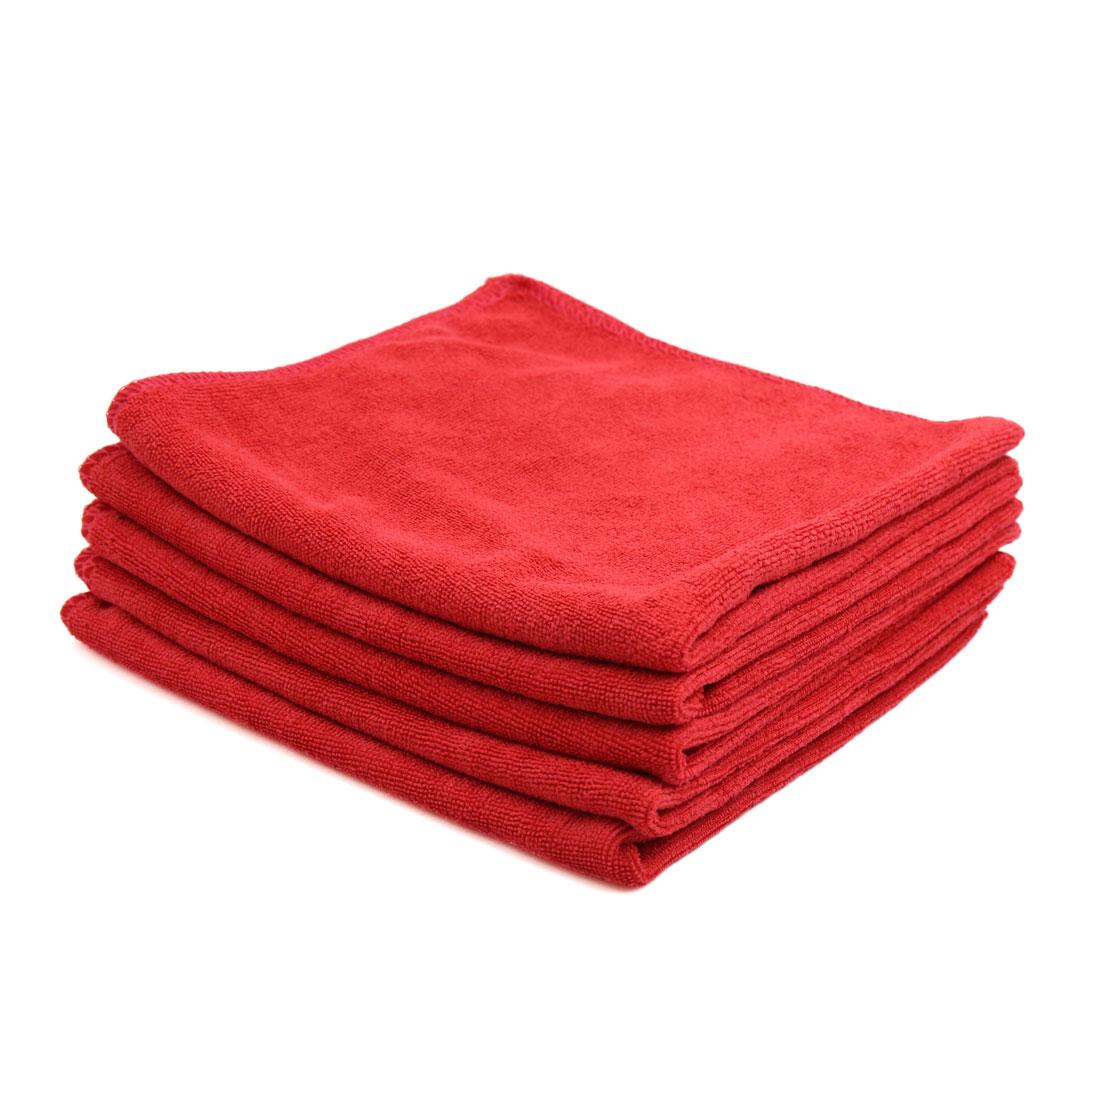 5pcs 40 x 40cm 300GSM Microfiber Home Car Towel Drying Washing Cloth Red